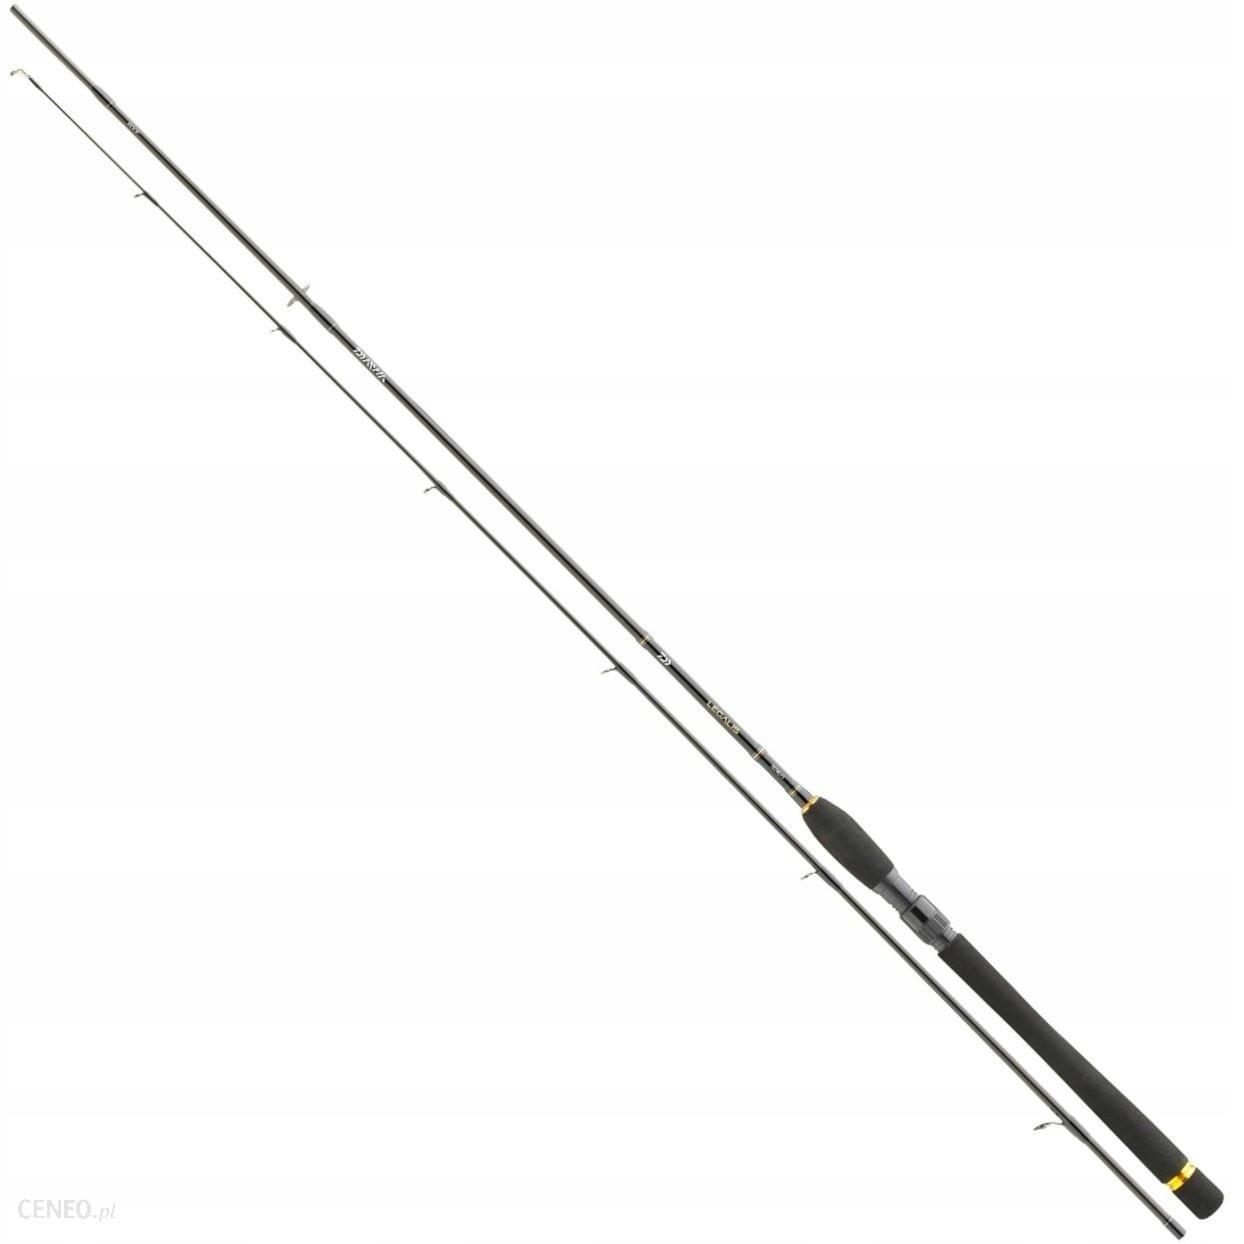 Daiwa Legalis Spin 5-20g / 240cm